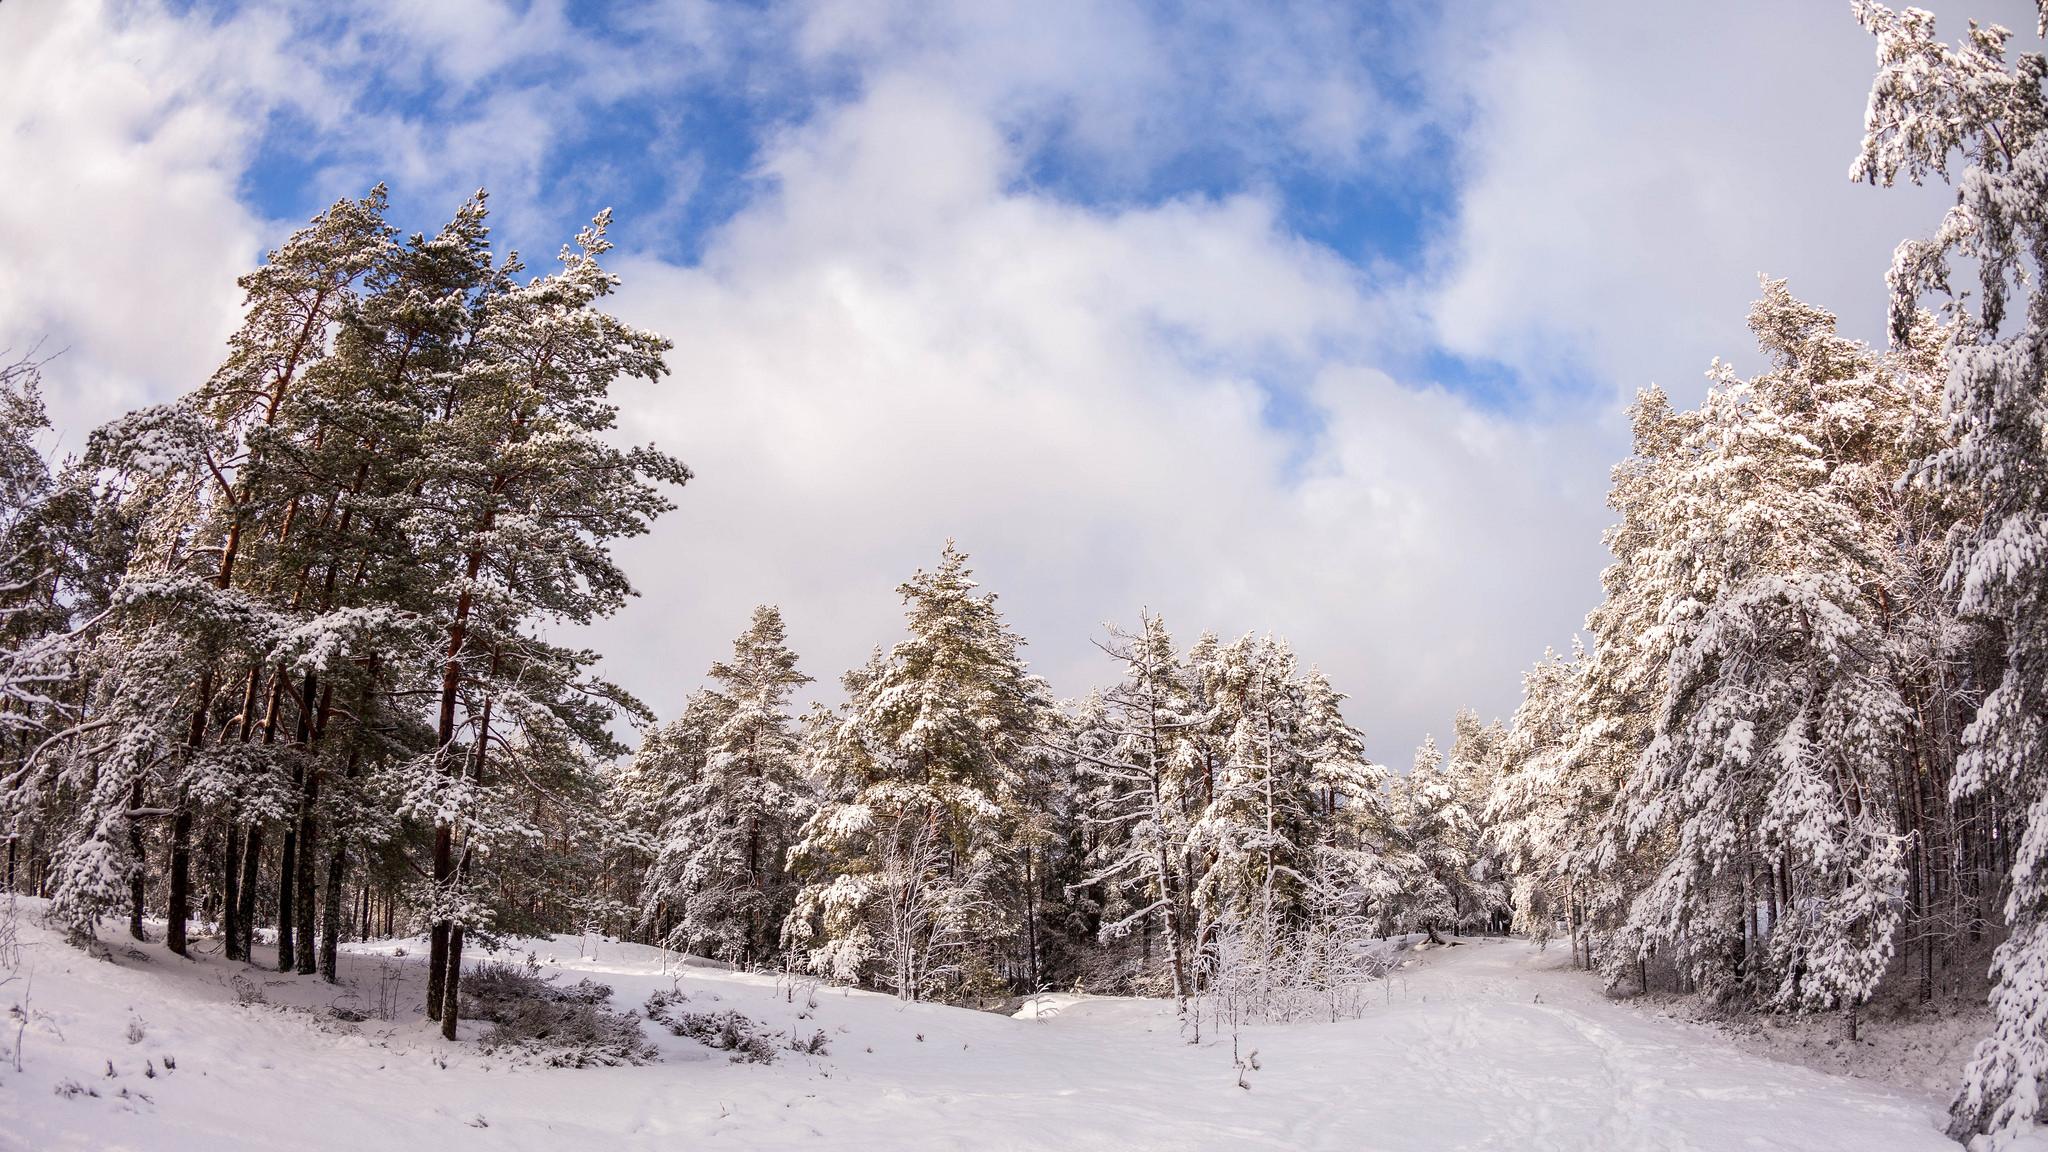 Viherkallio, Espoo, Finland